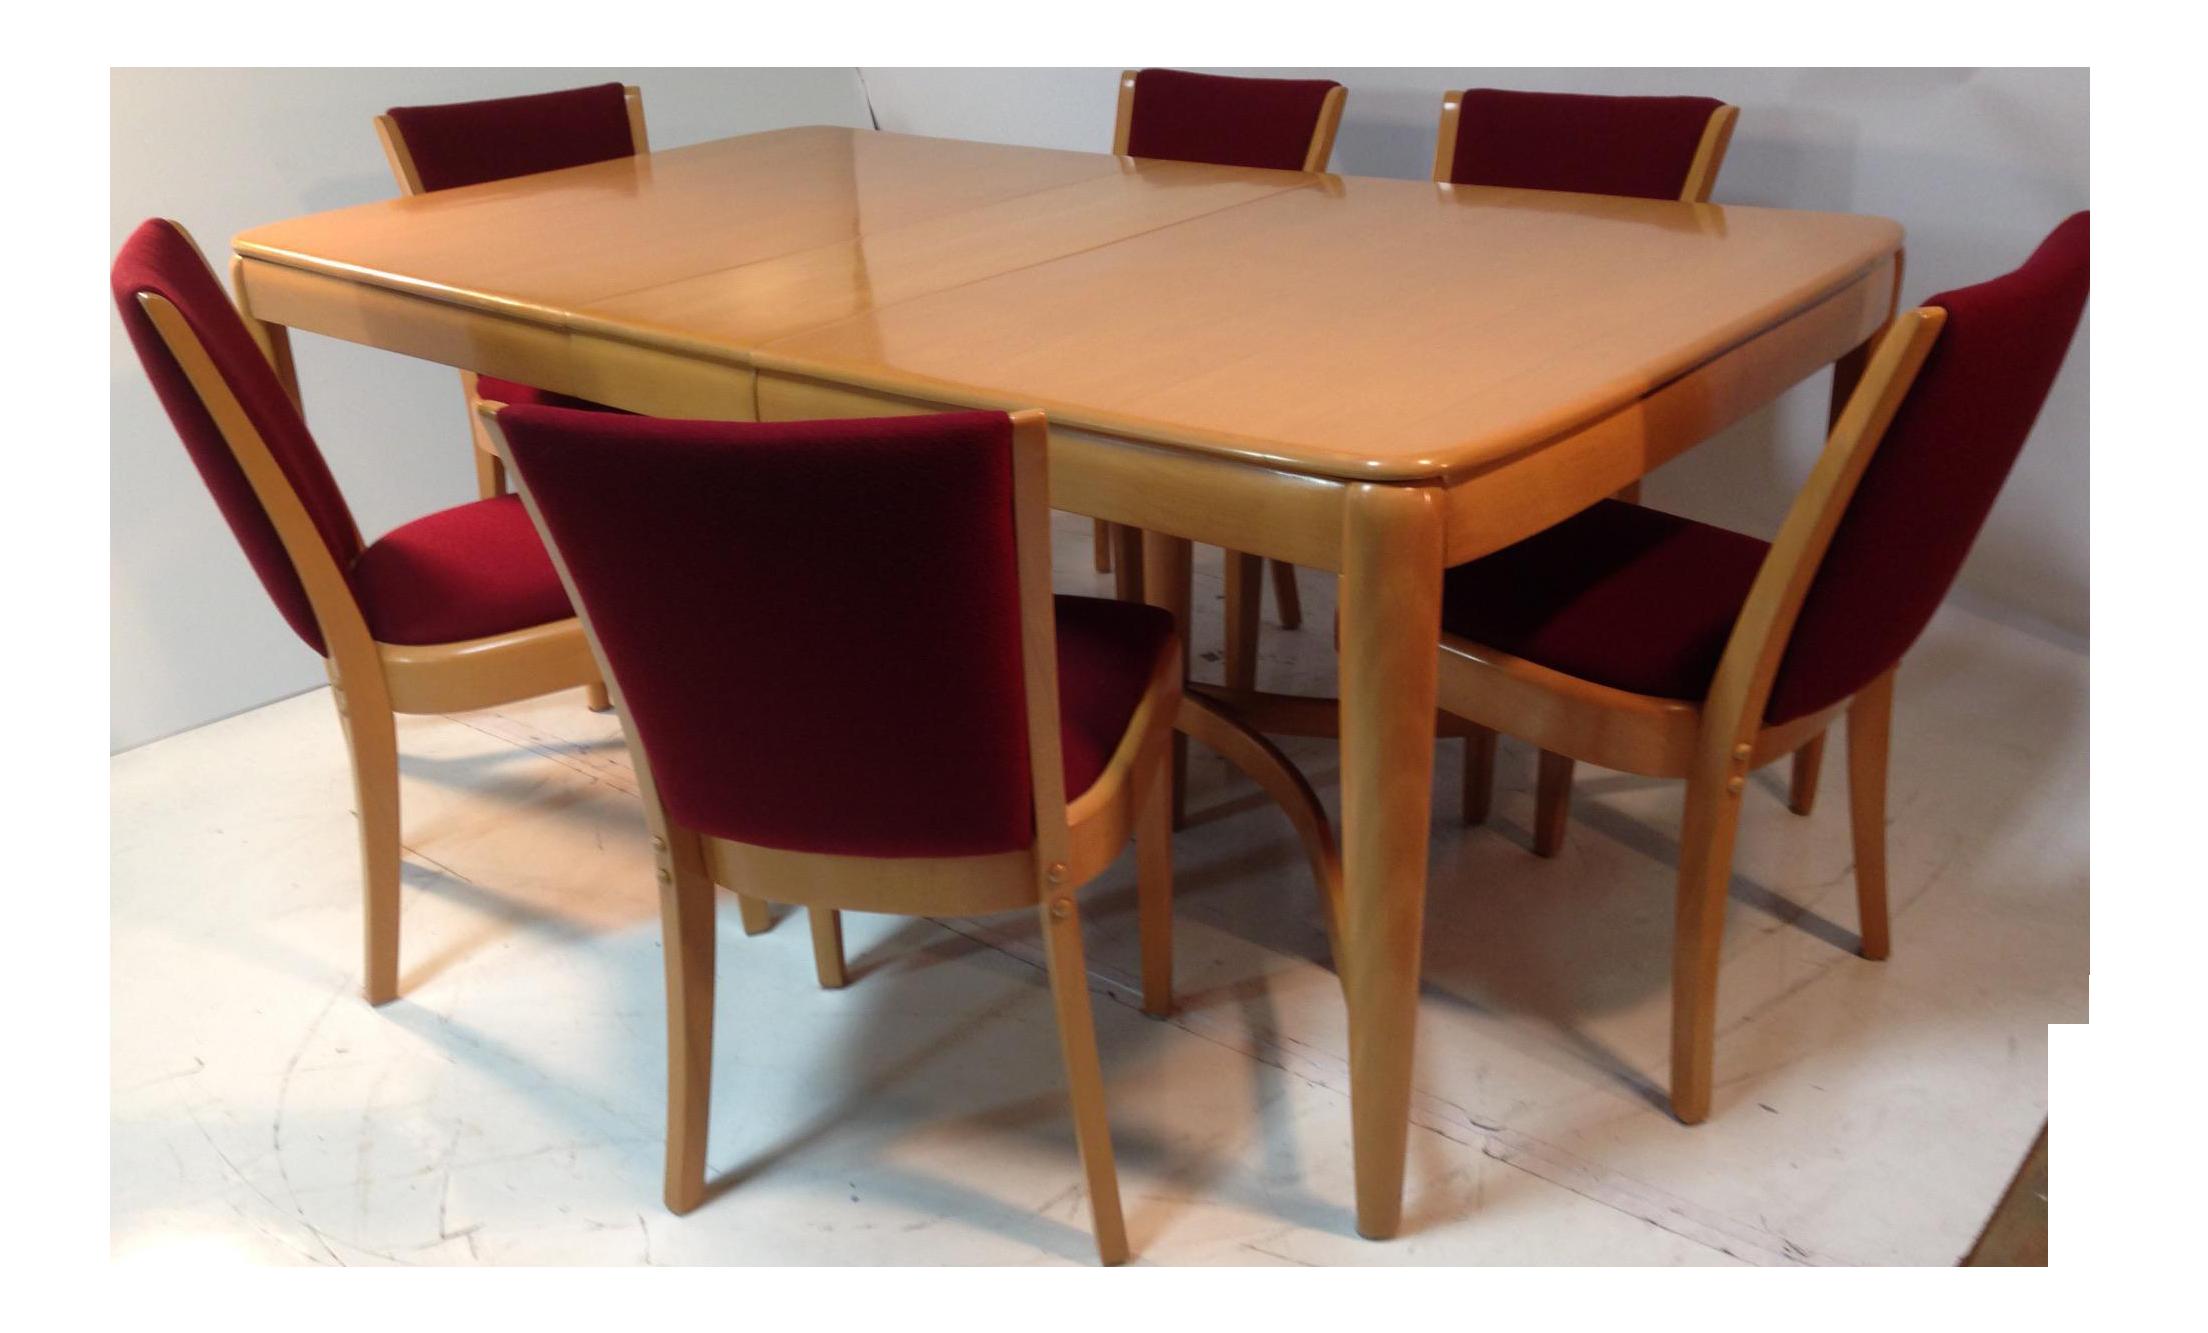 1940s Vintage Heywood Wakefield Dining Set Chairish : 7fd41cbc 2b88 4b2d 8943 3023cce5597easpectfitampwidth640ampheight640 from www.chairish.com size 640 x 640 jpeg 26kB